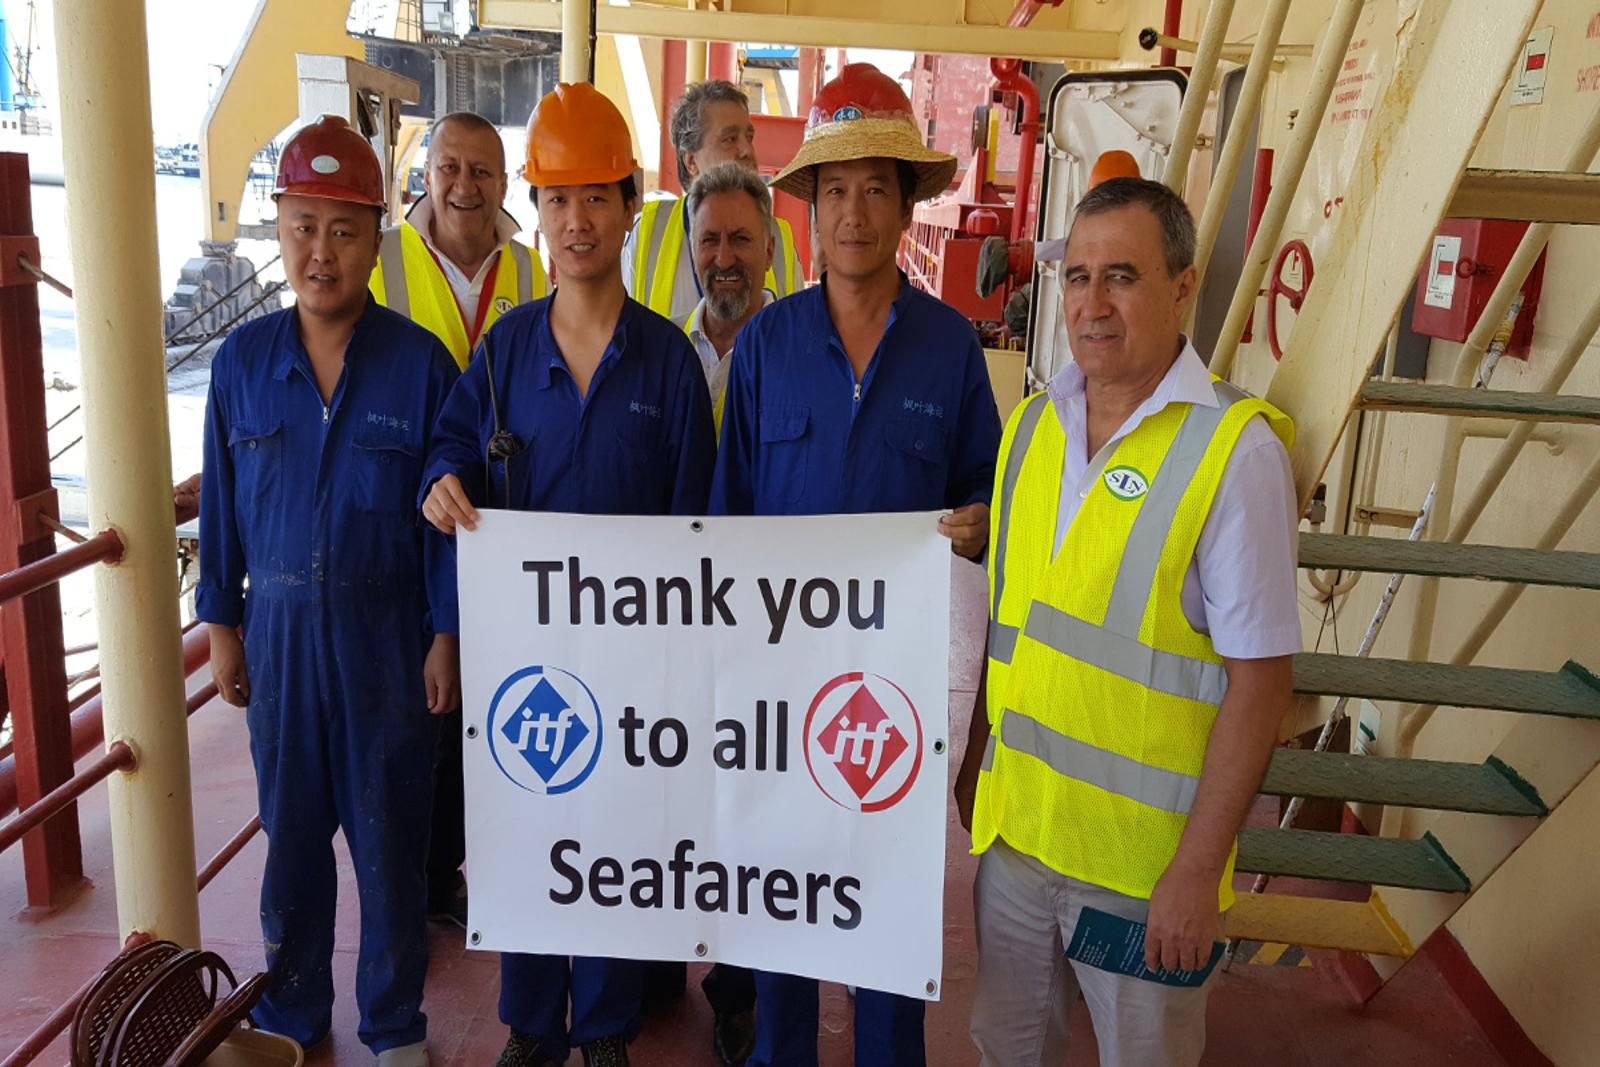 Seafarers celebrated their day at Seamen's Club